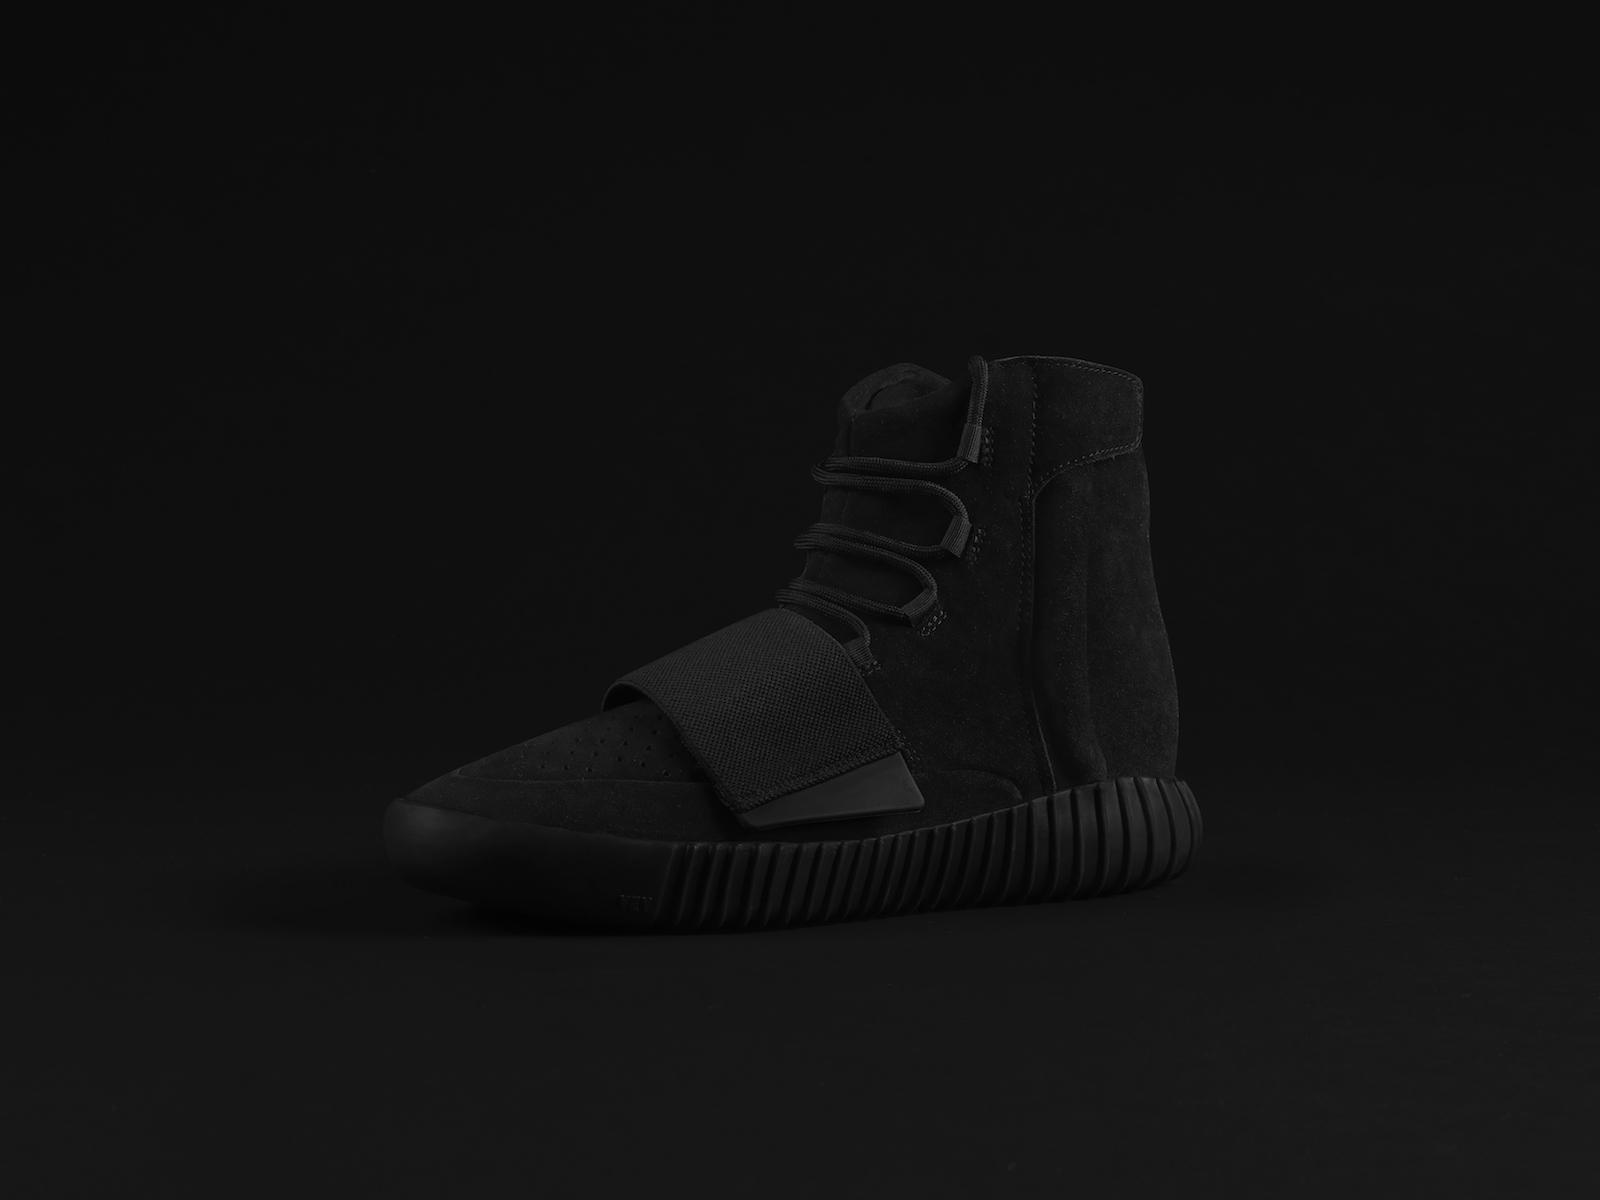 a1efcc8a250e2 Adidas Yeezy Boost 750 Black Informaes Do Lanamento 1600x1200